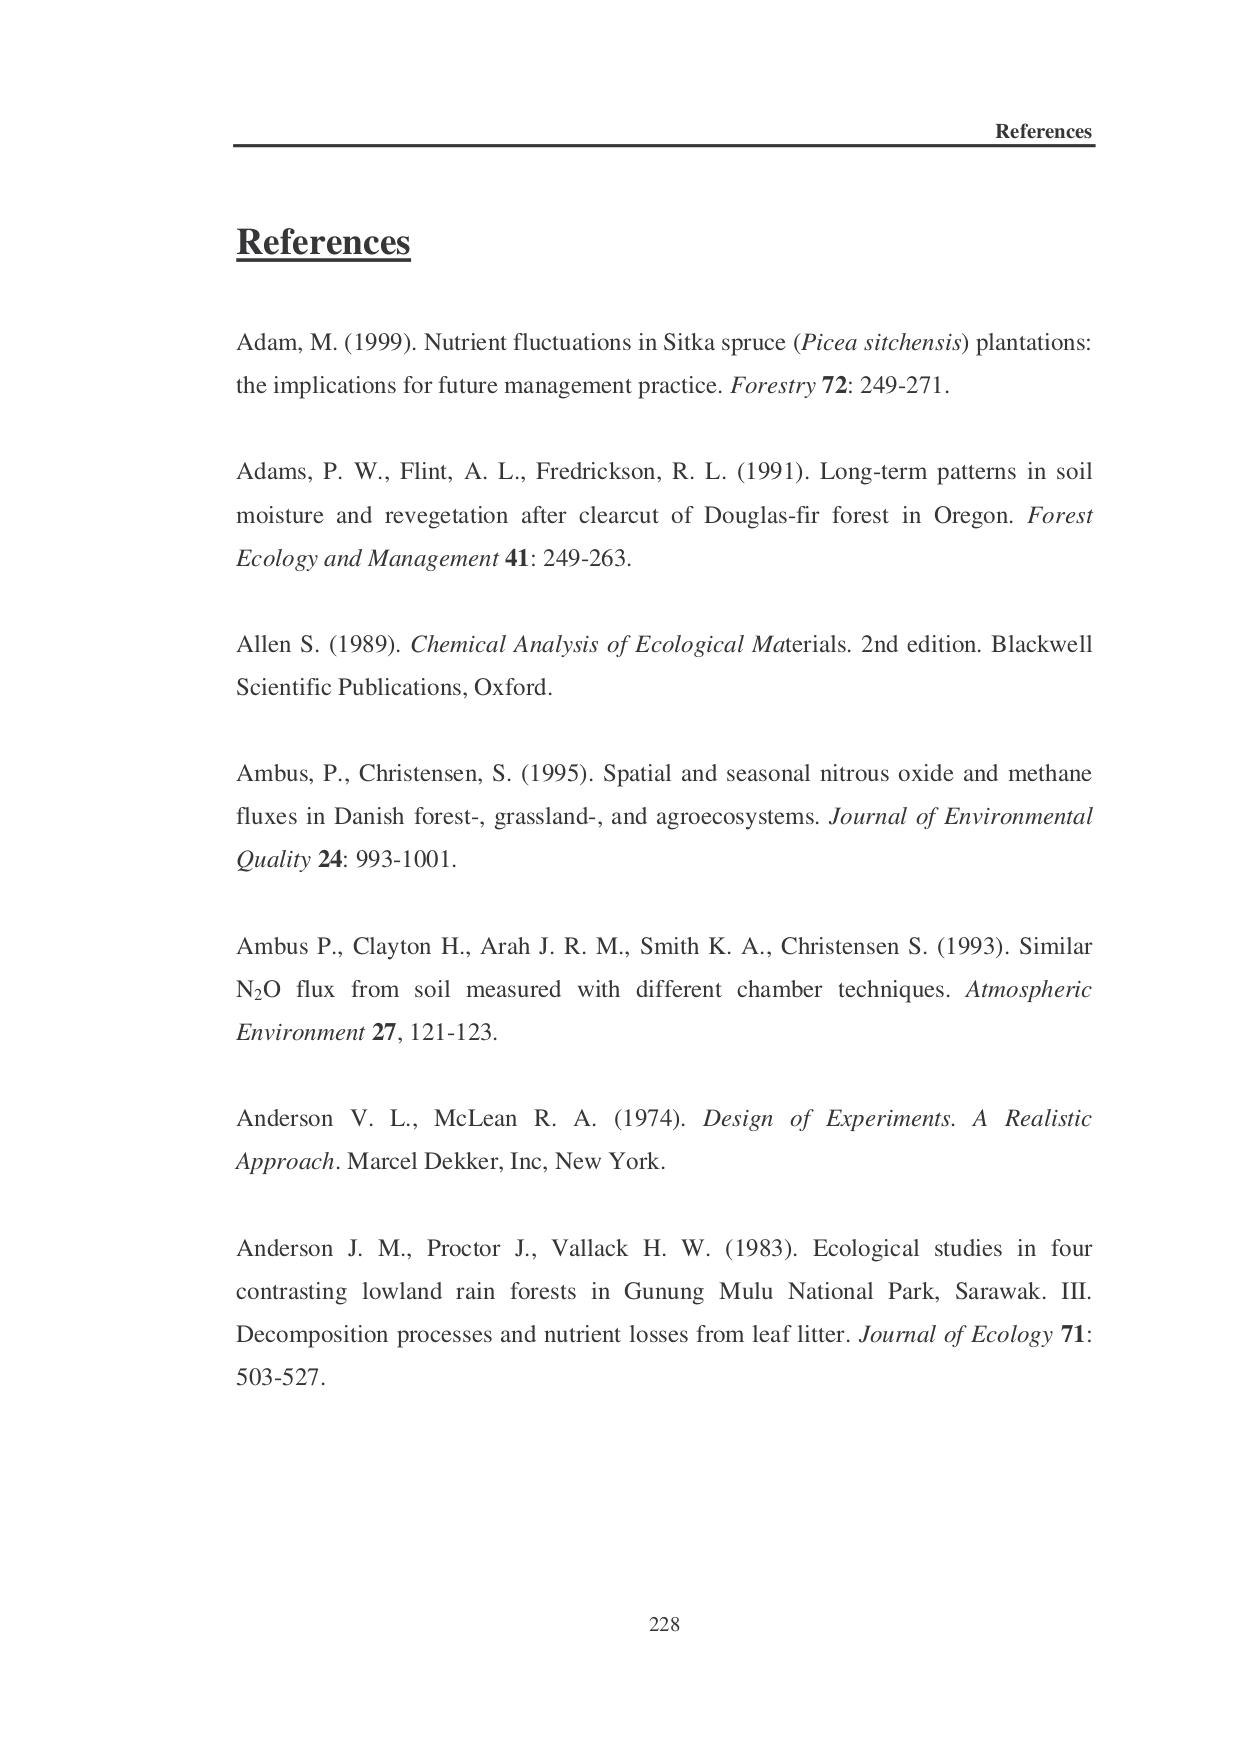 pdf for LaCie Storage 301534 manual